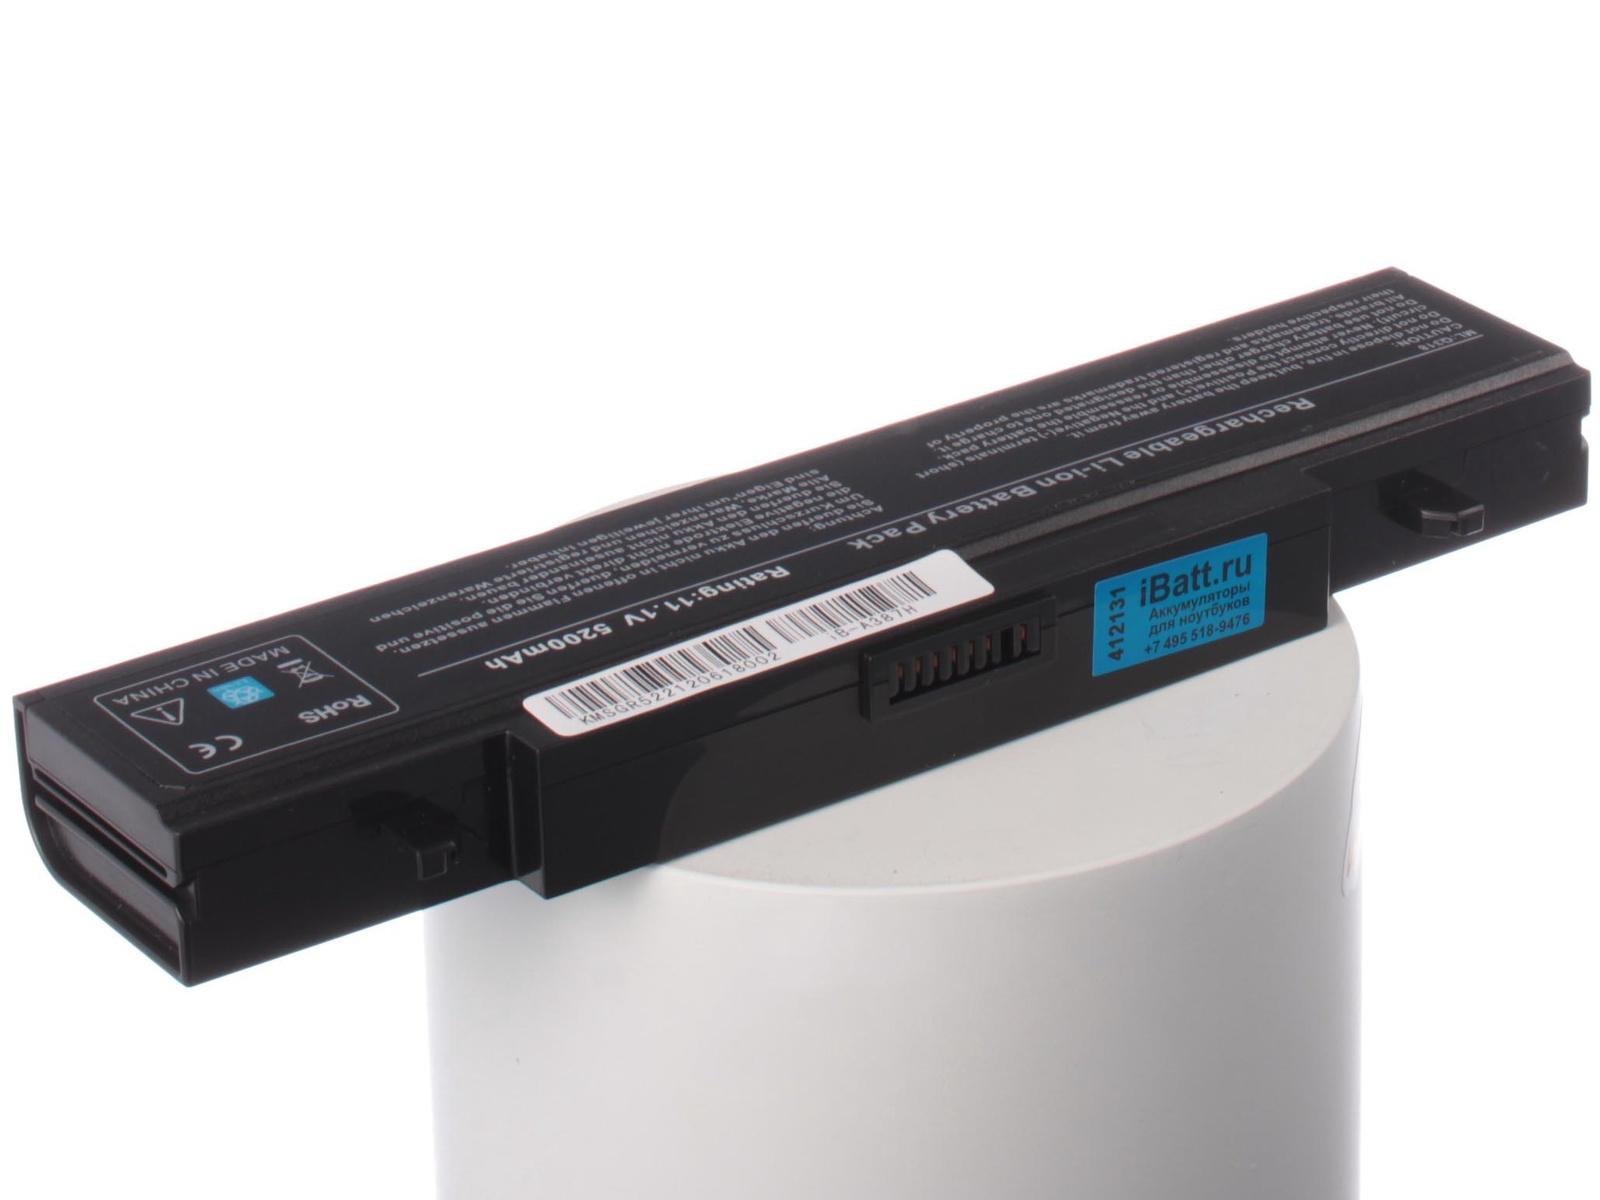 Аккумулятор для ноутбука iBatt для Samsung 300E5V-A02, 300V5A-S01, 305V5A-T07, 350E7C-A03, 350V5C-S07, 350V5C-S0F, 355V5X-S01, R425-JS01, R425-JS04, R540-JS02, R540-JT06, RV408-A01, RV511-S0A, 270E5E-K02, 300E5A-S08, 300E7A-S06 аккумулятор для ноутбука ibatt для samsung rc510 s03 rc720 s01 rv515 s01 rv515 s07 rv520 a01 270e5e x06 300v4a a04 300v5a s0w 305v5a a01 350v5c s1f 550p5c s01 r425 js02 r528 da01 r730 jb02 rc510 s05 rf510 s02